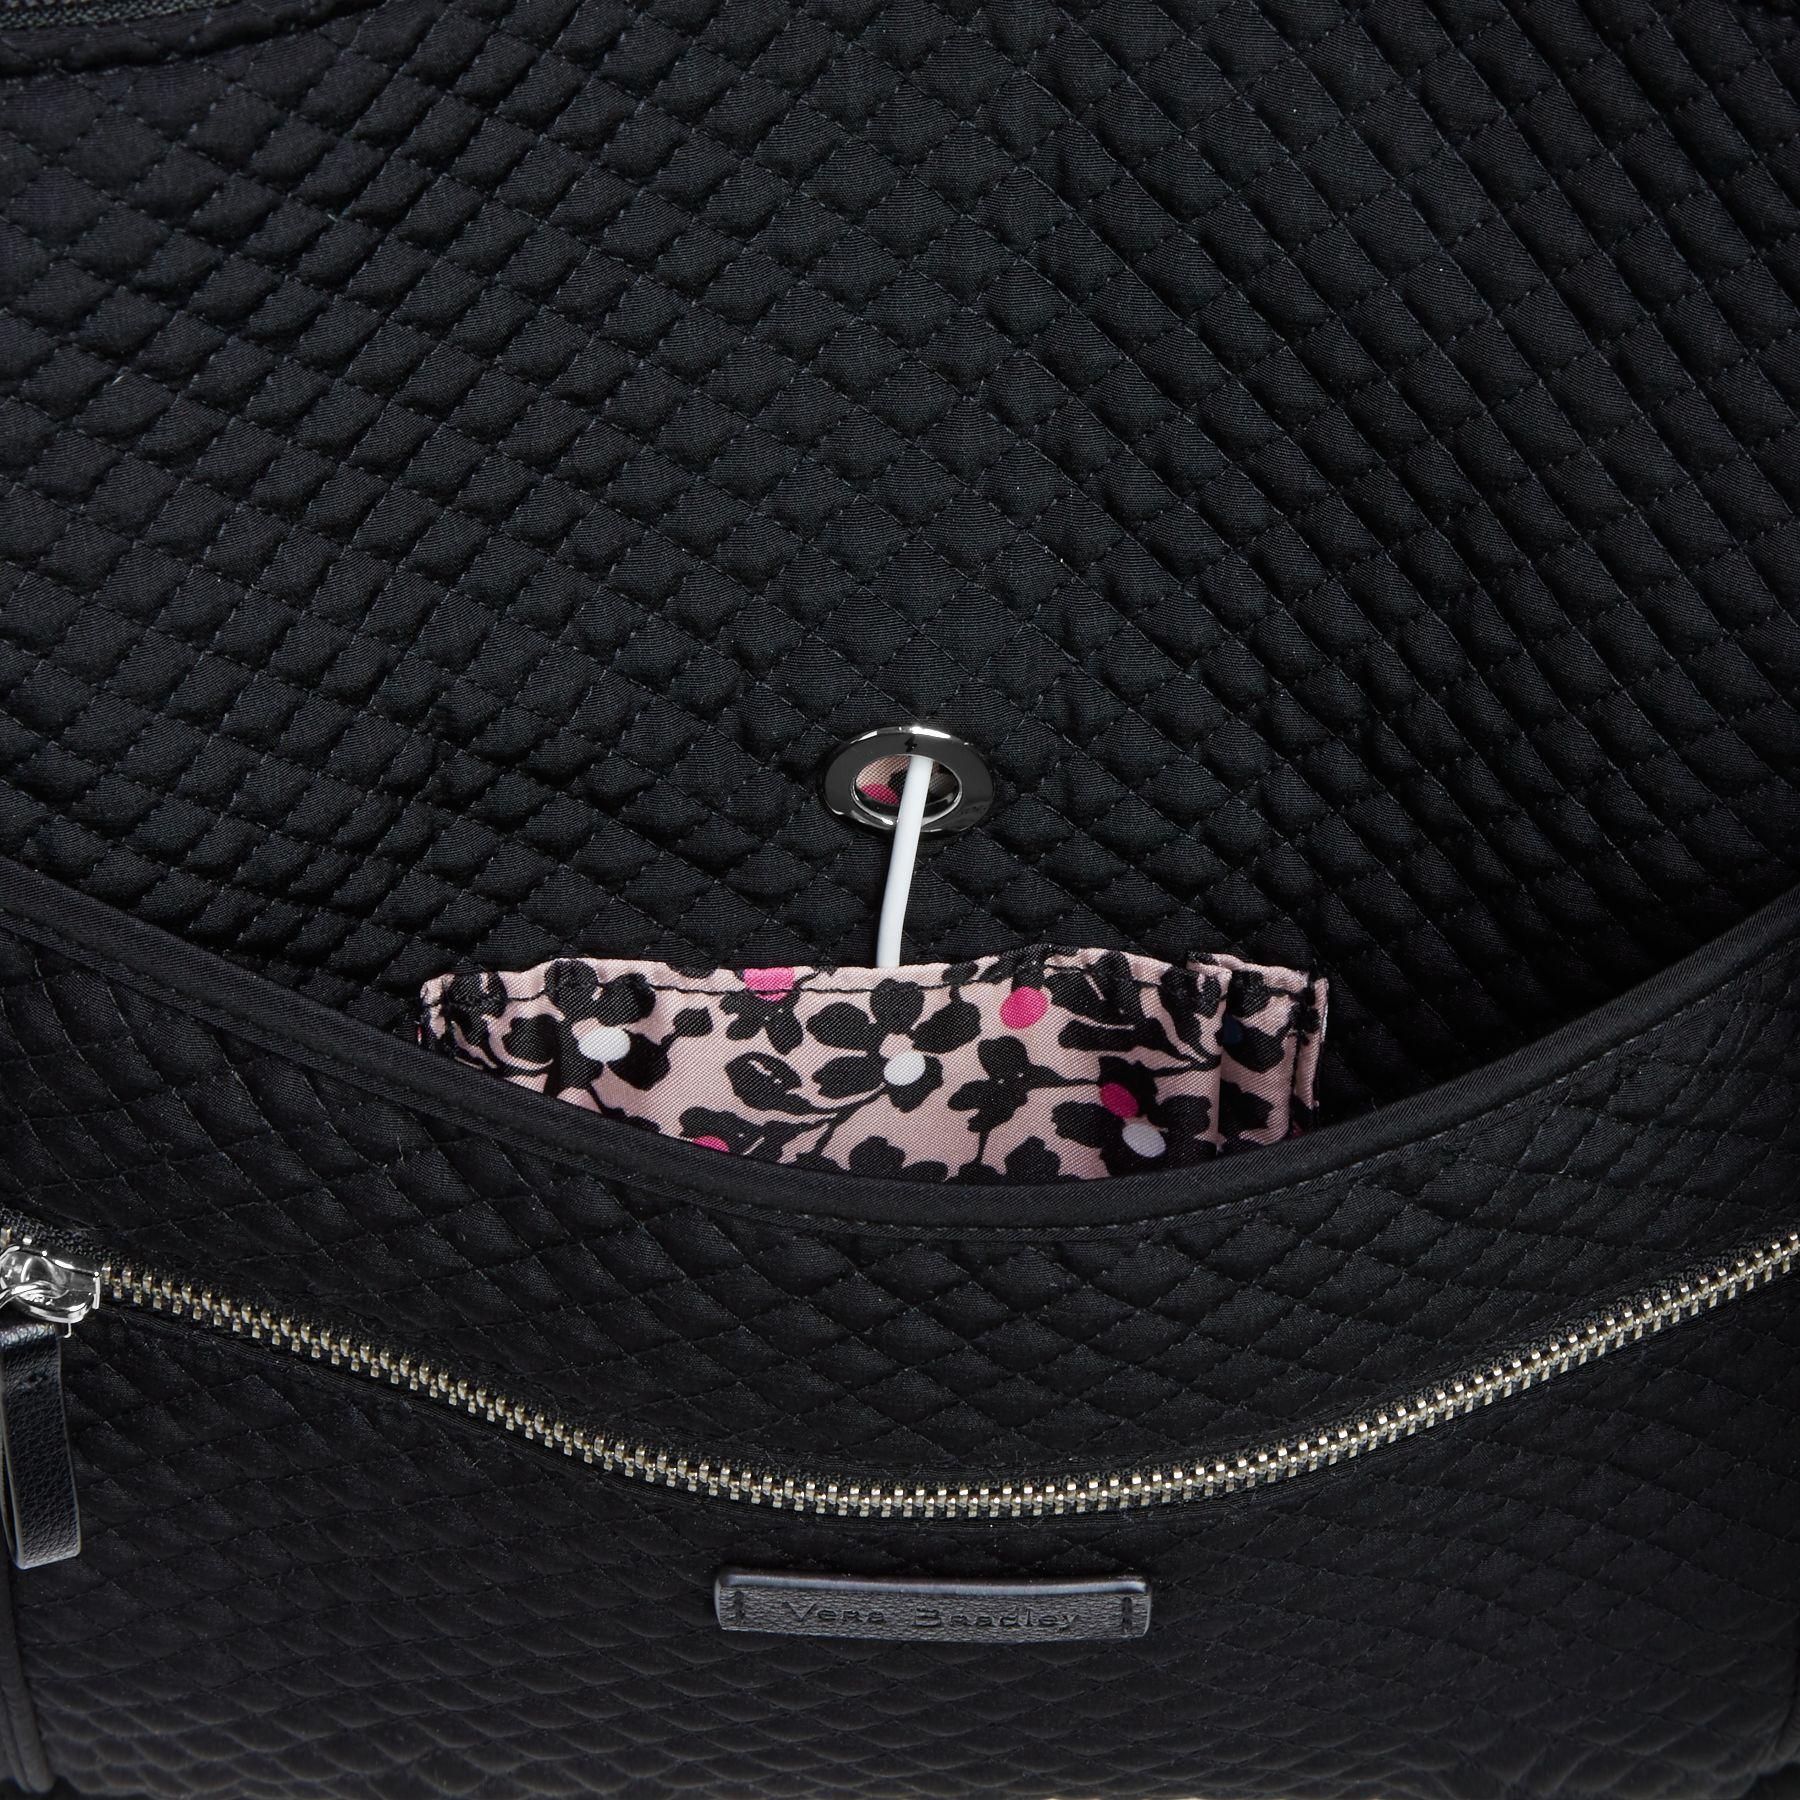 Lyst - Vera Bradley Iconic Miller Travel Bag in Black a816d2ba74cc7